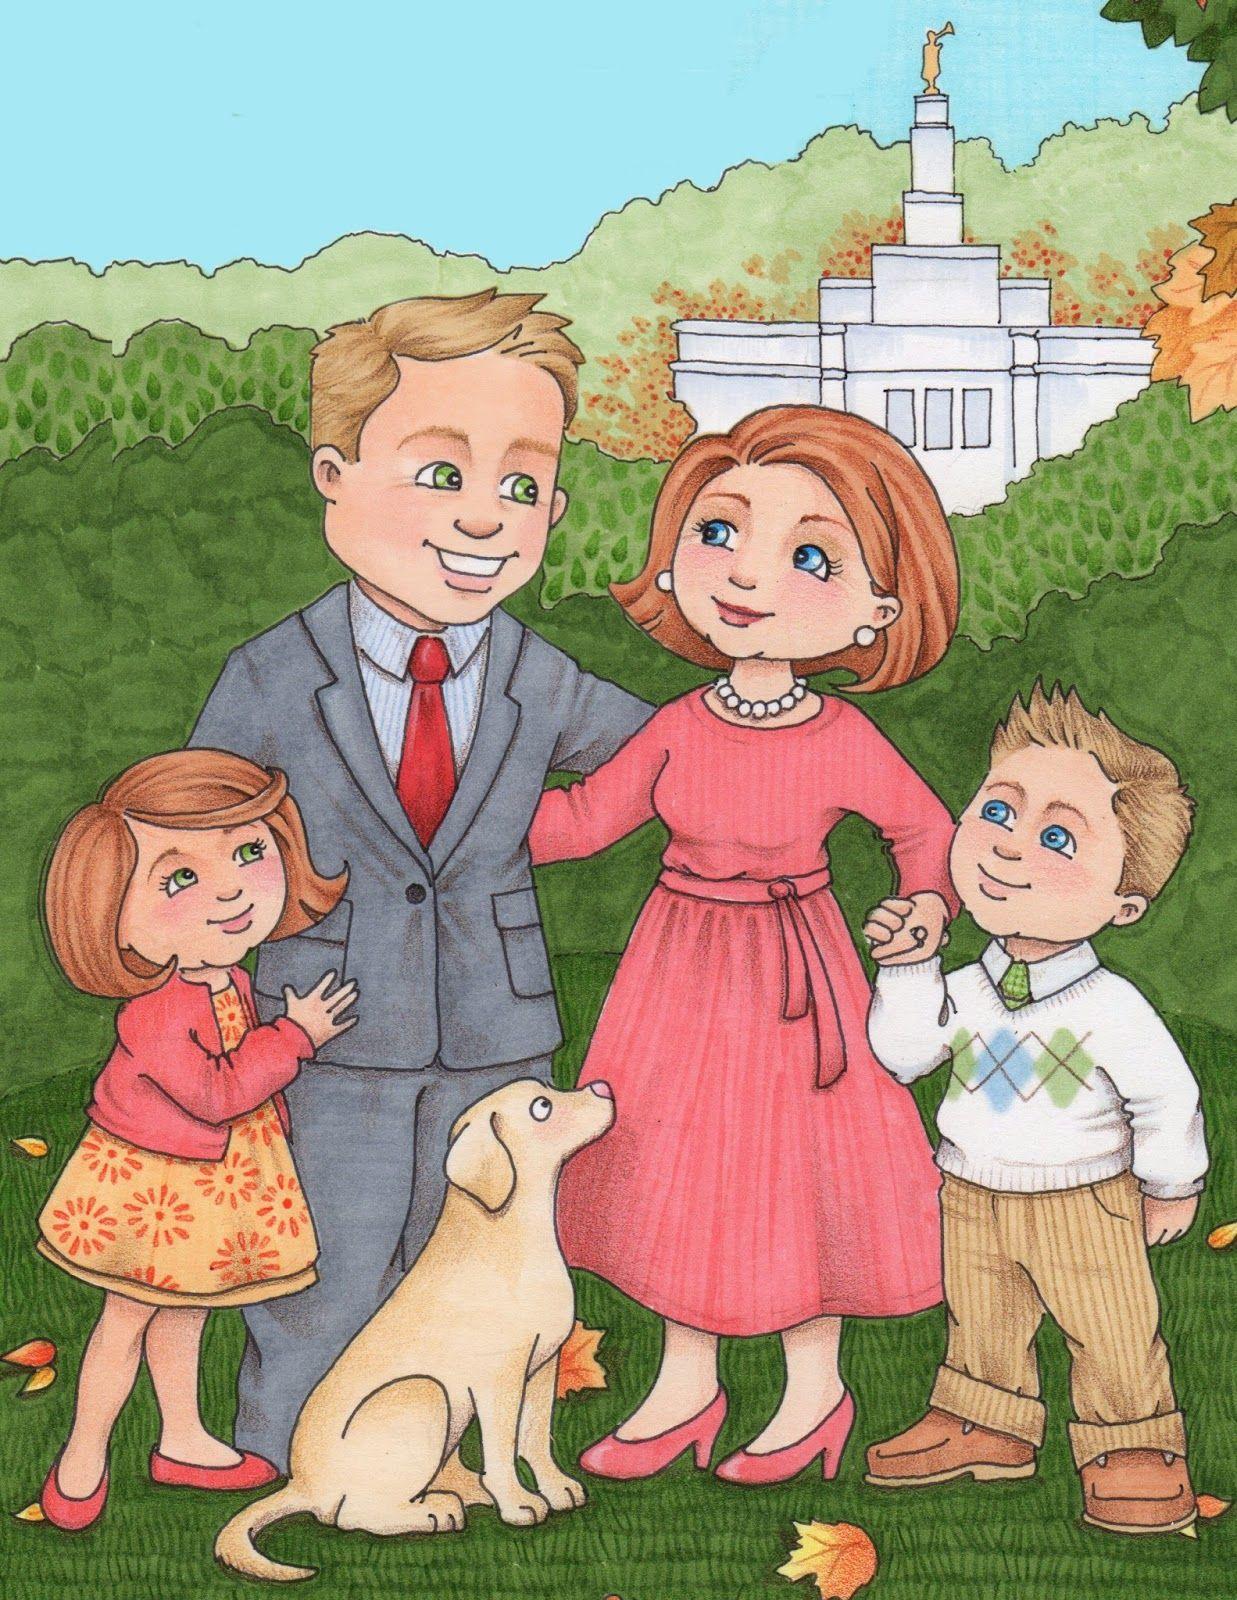 Lds clipart family. Susan fitch design families